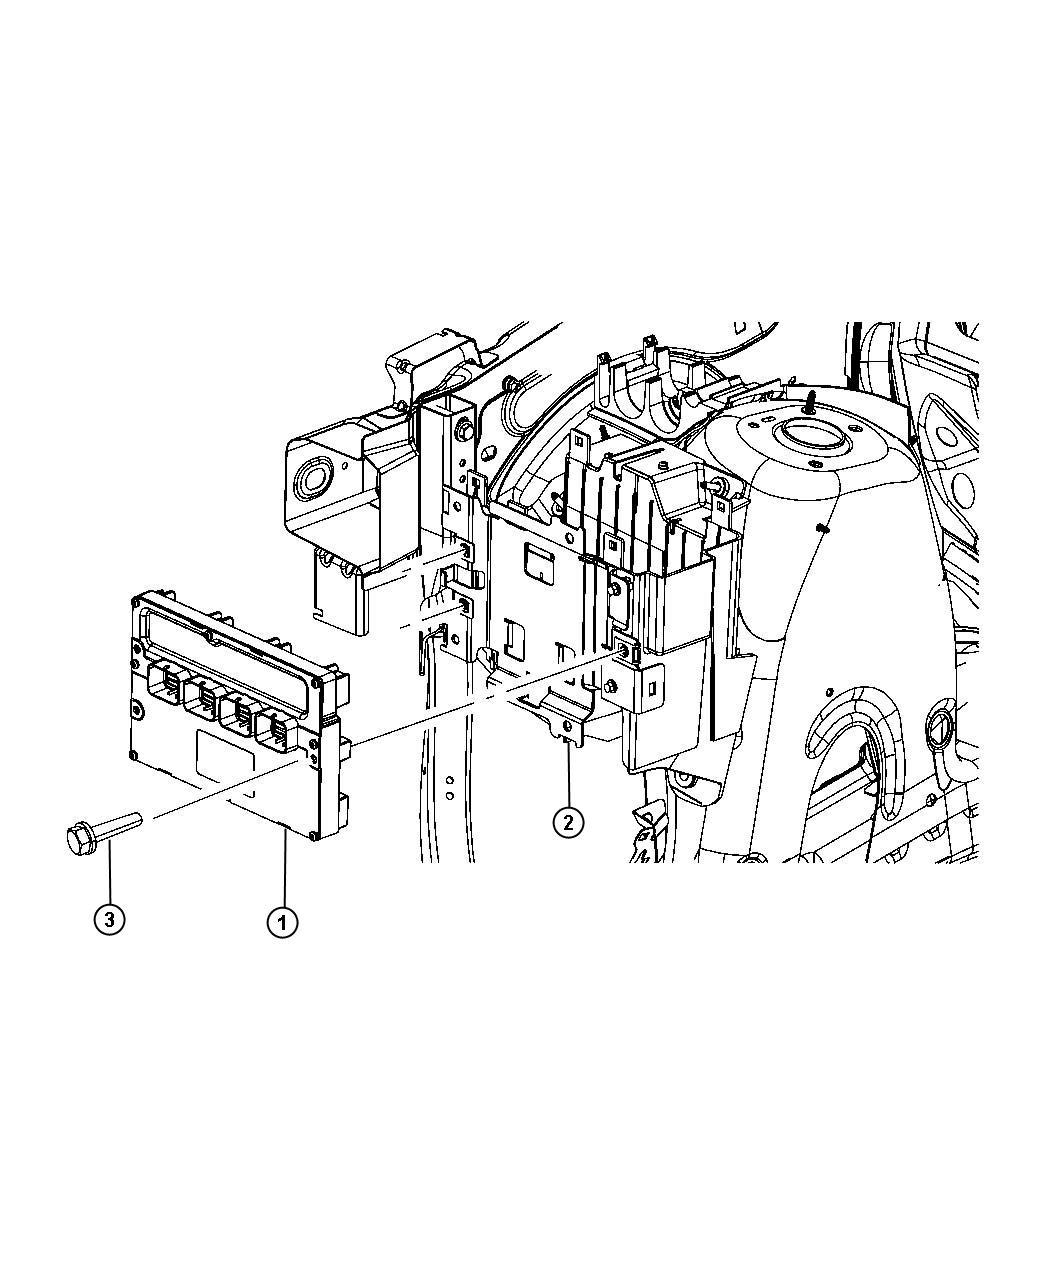 2011 Dodge Module  Powertrain Control  Generic  Engine